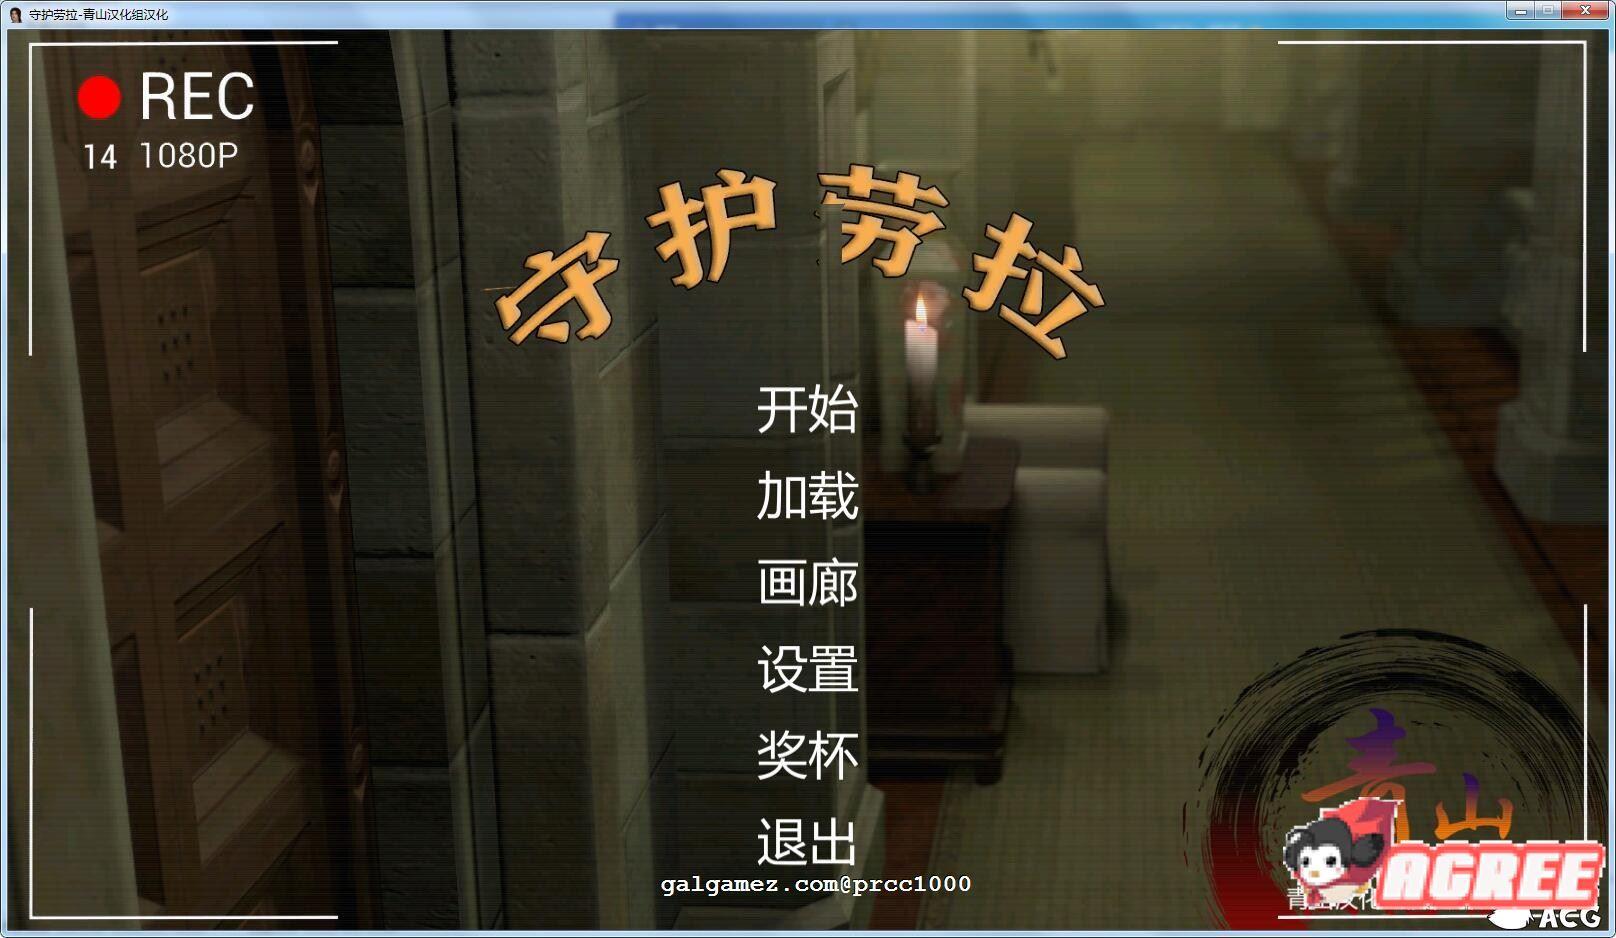 【3D解密/汉化/全动态】古墓丽影同人-守护劳拉 V0.64精修汉化版+攻略+动画【2G】